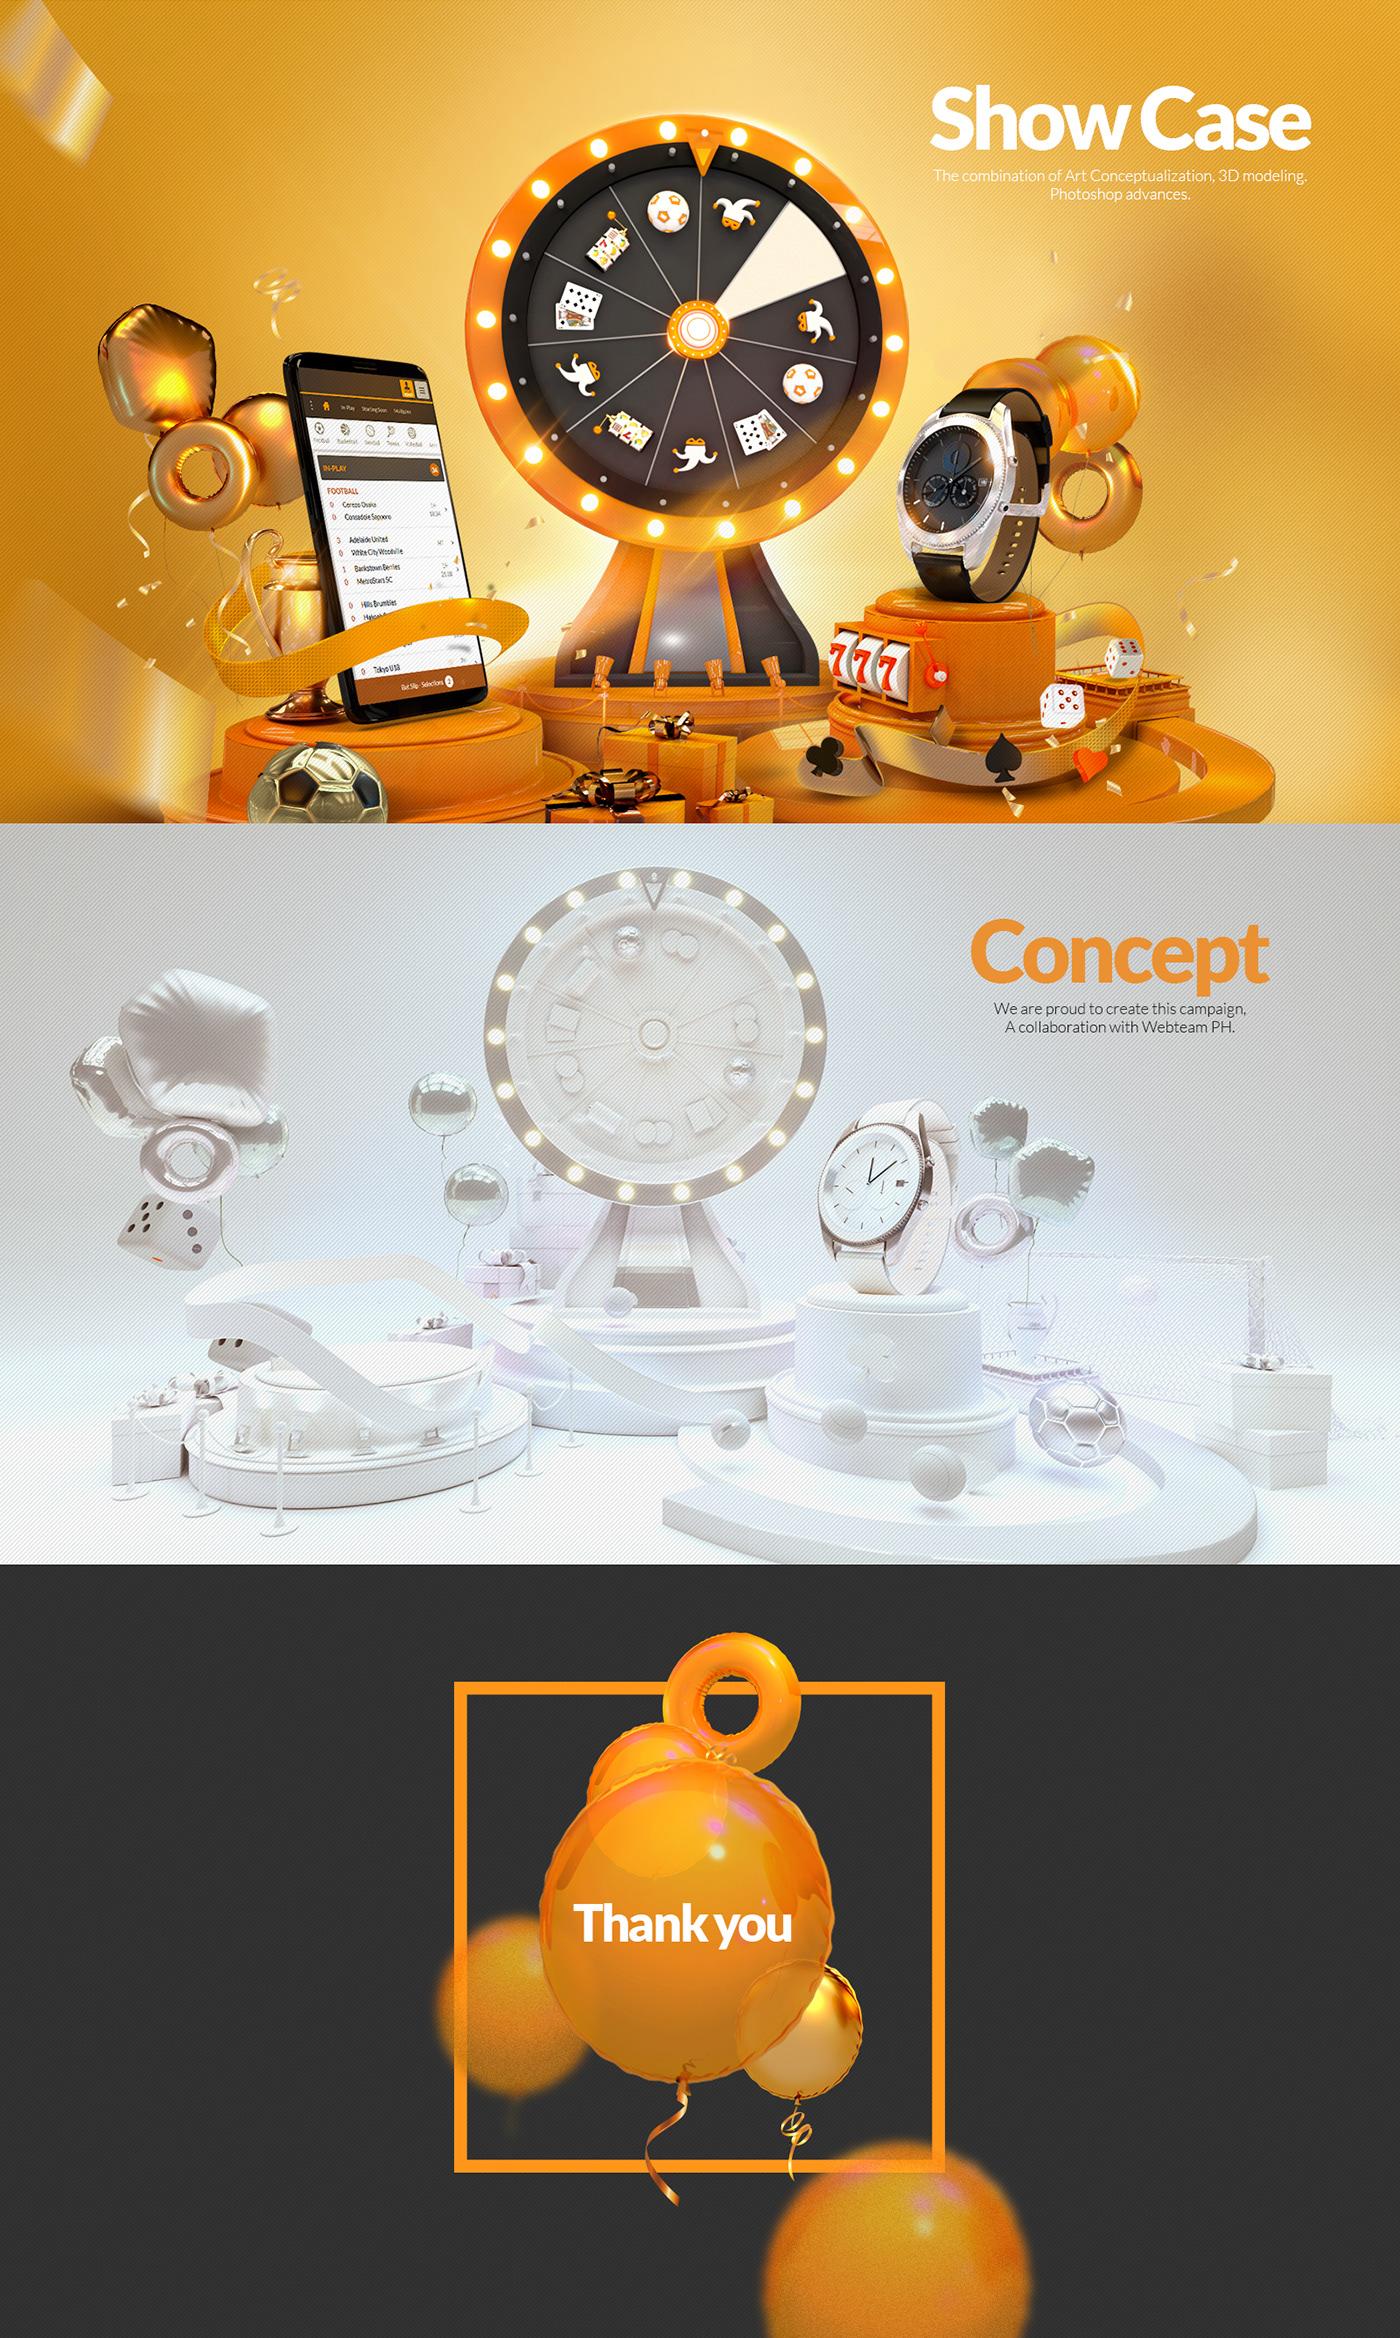 Image may contain: clock, cartoon and tableware